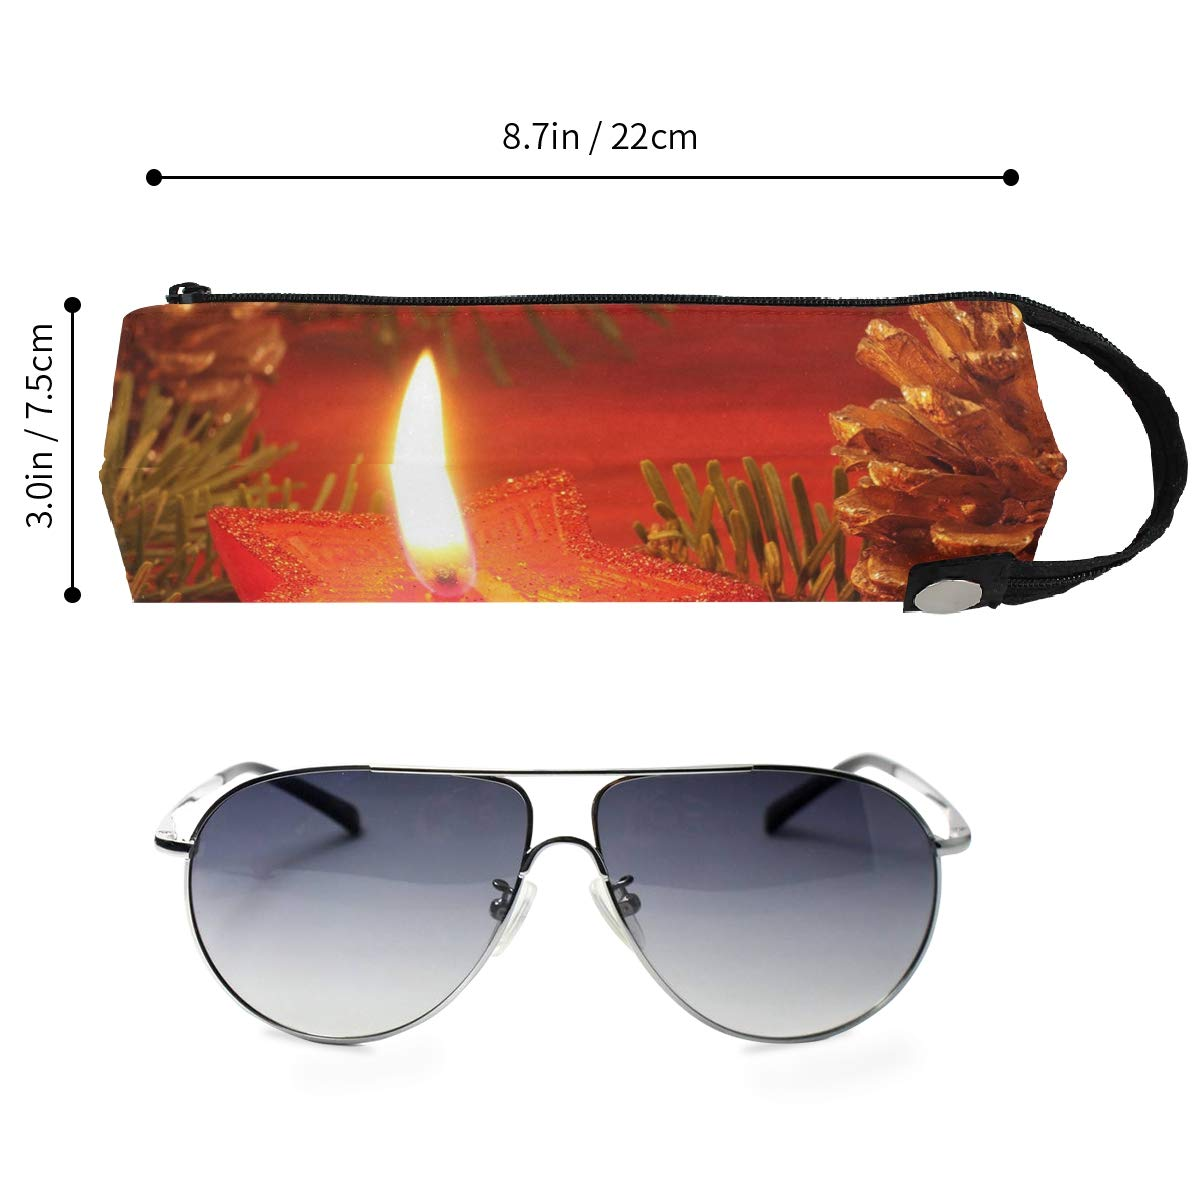 Glasses Case Christmas Star Candles Travel Soft Sunglasses Pen Bag Protective Box